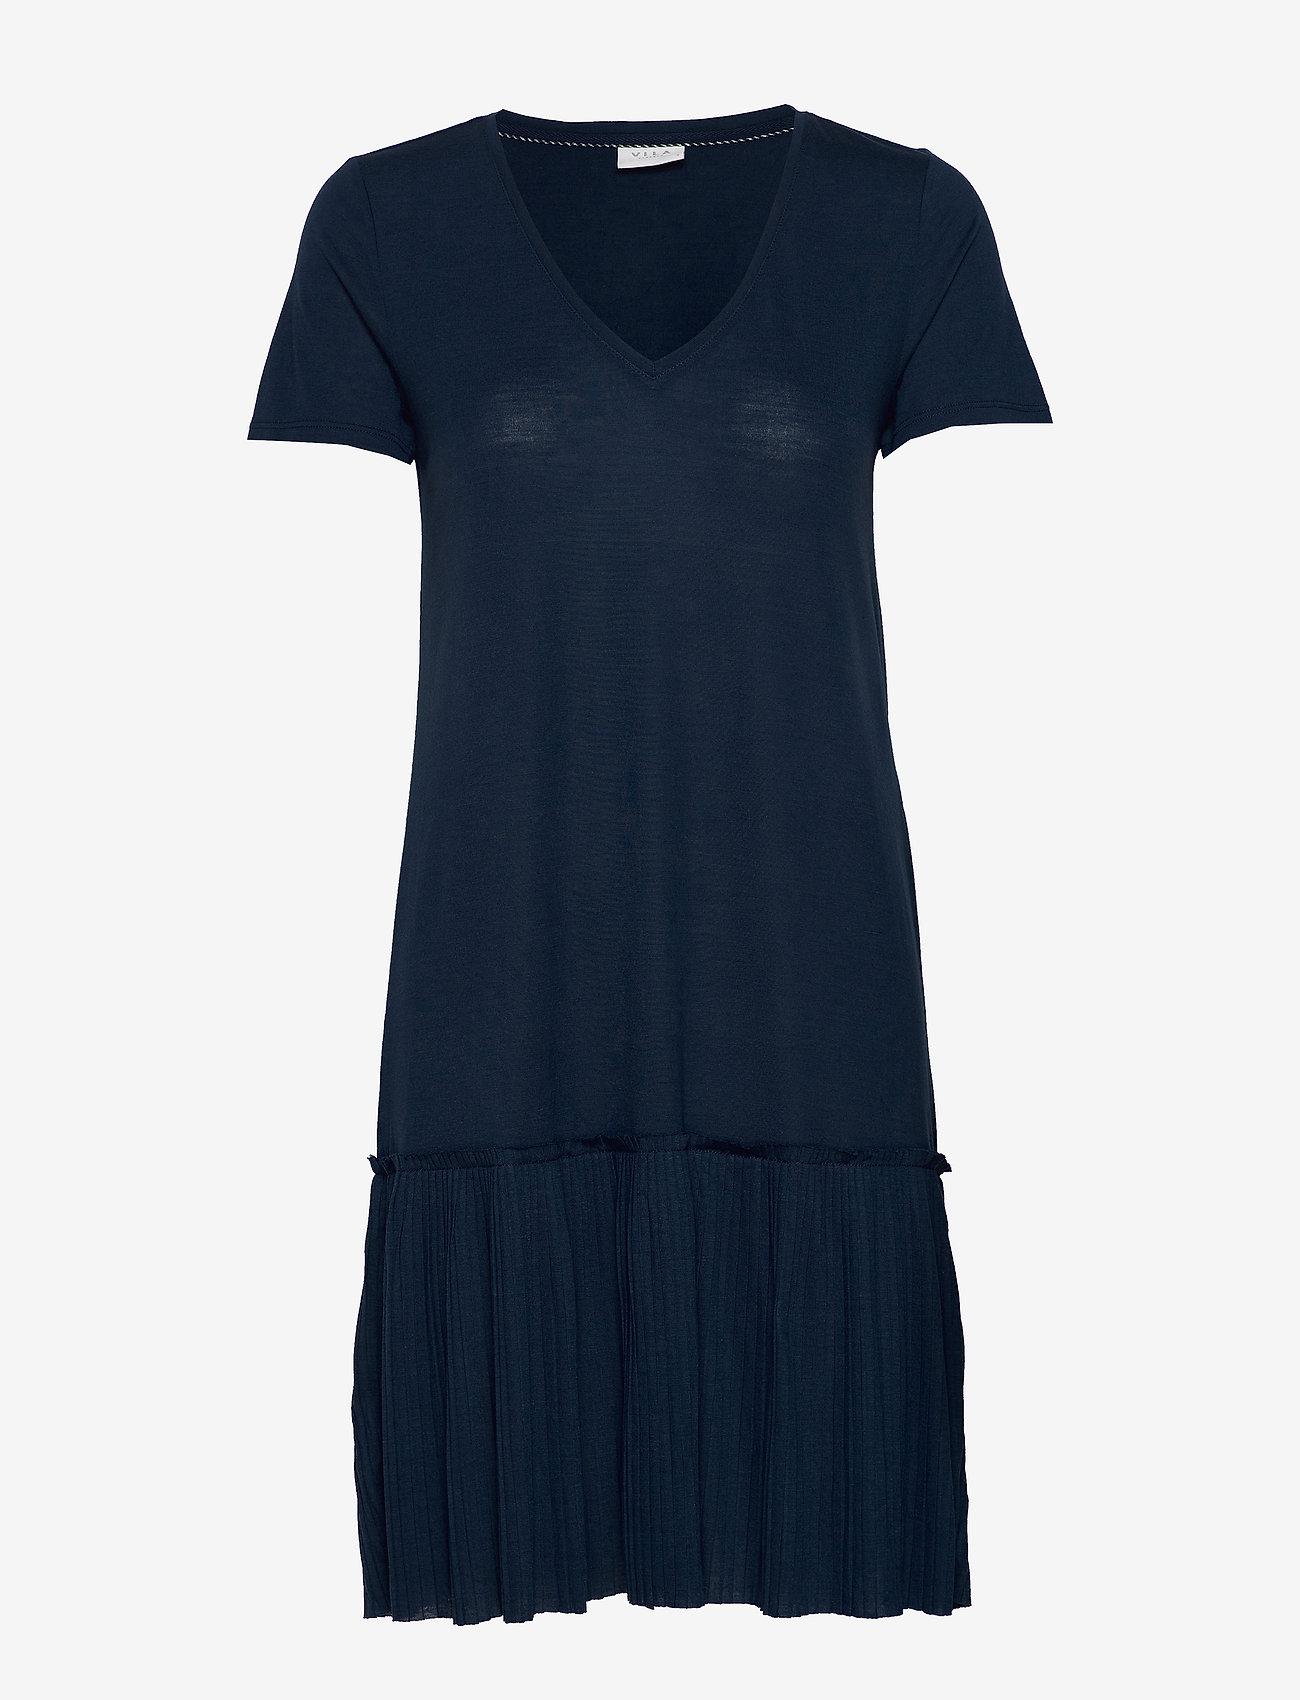 Vila - VIPLISS S/S DRESS - midi dresses - navy blazer